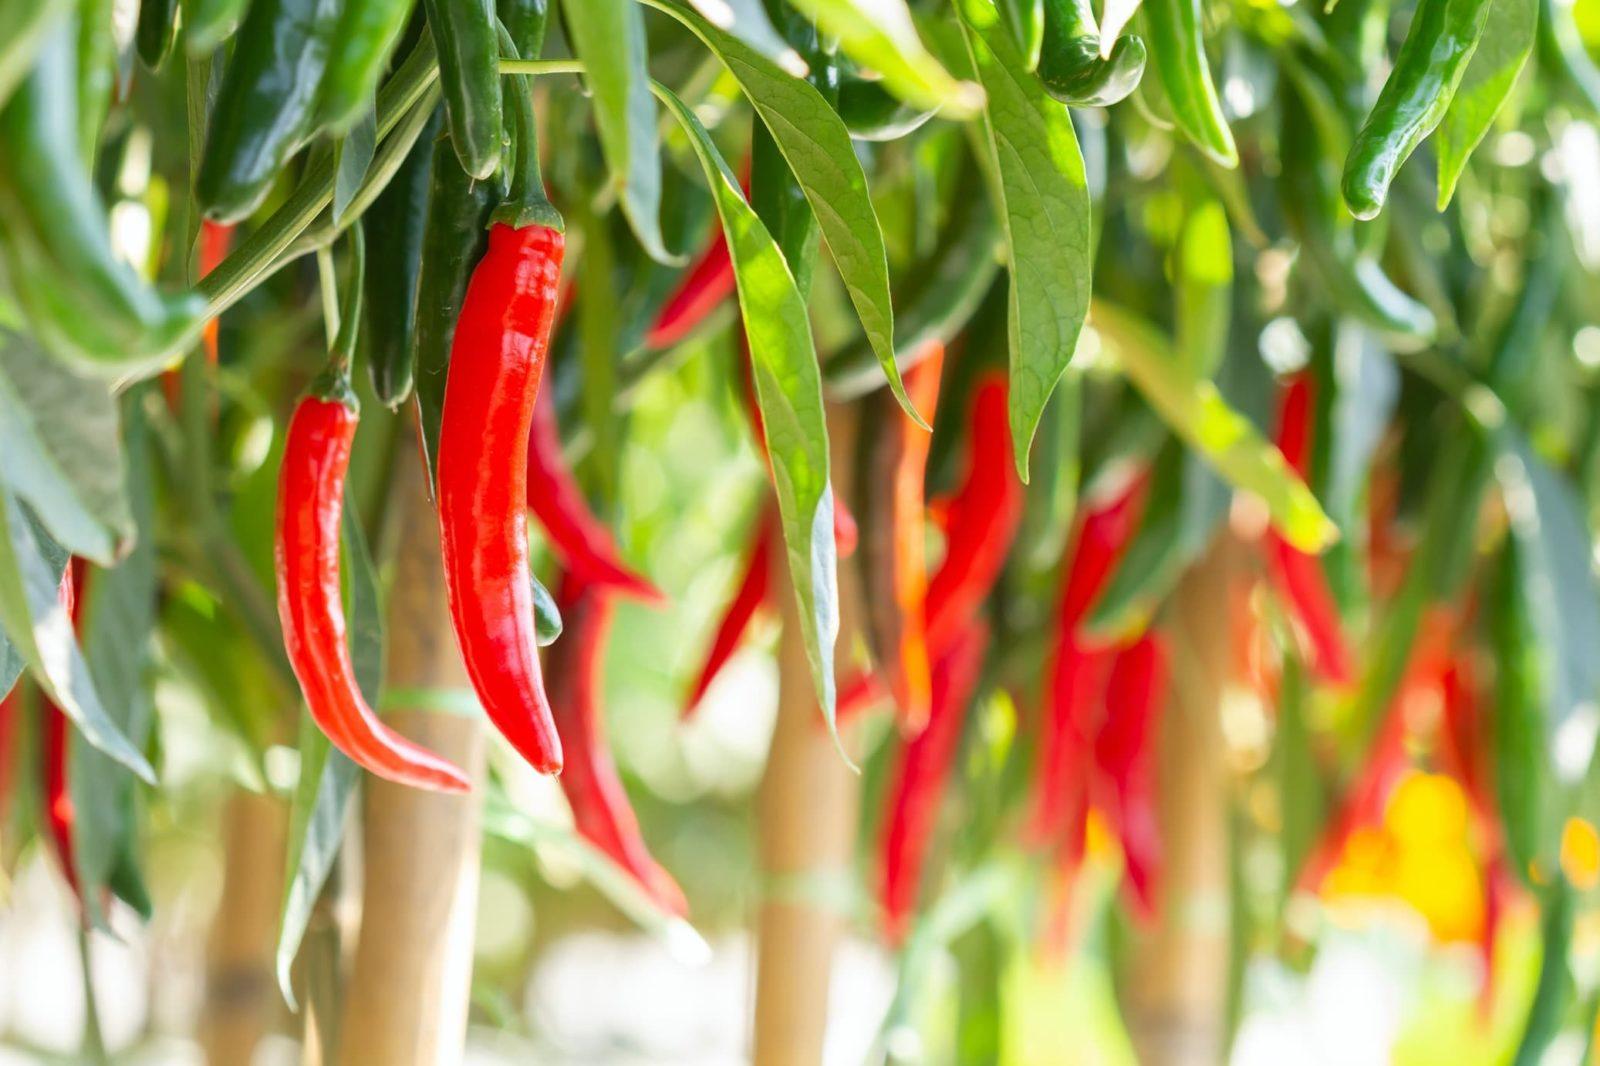 red chillies hanging amongst foliage